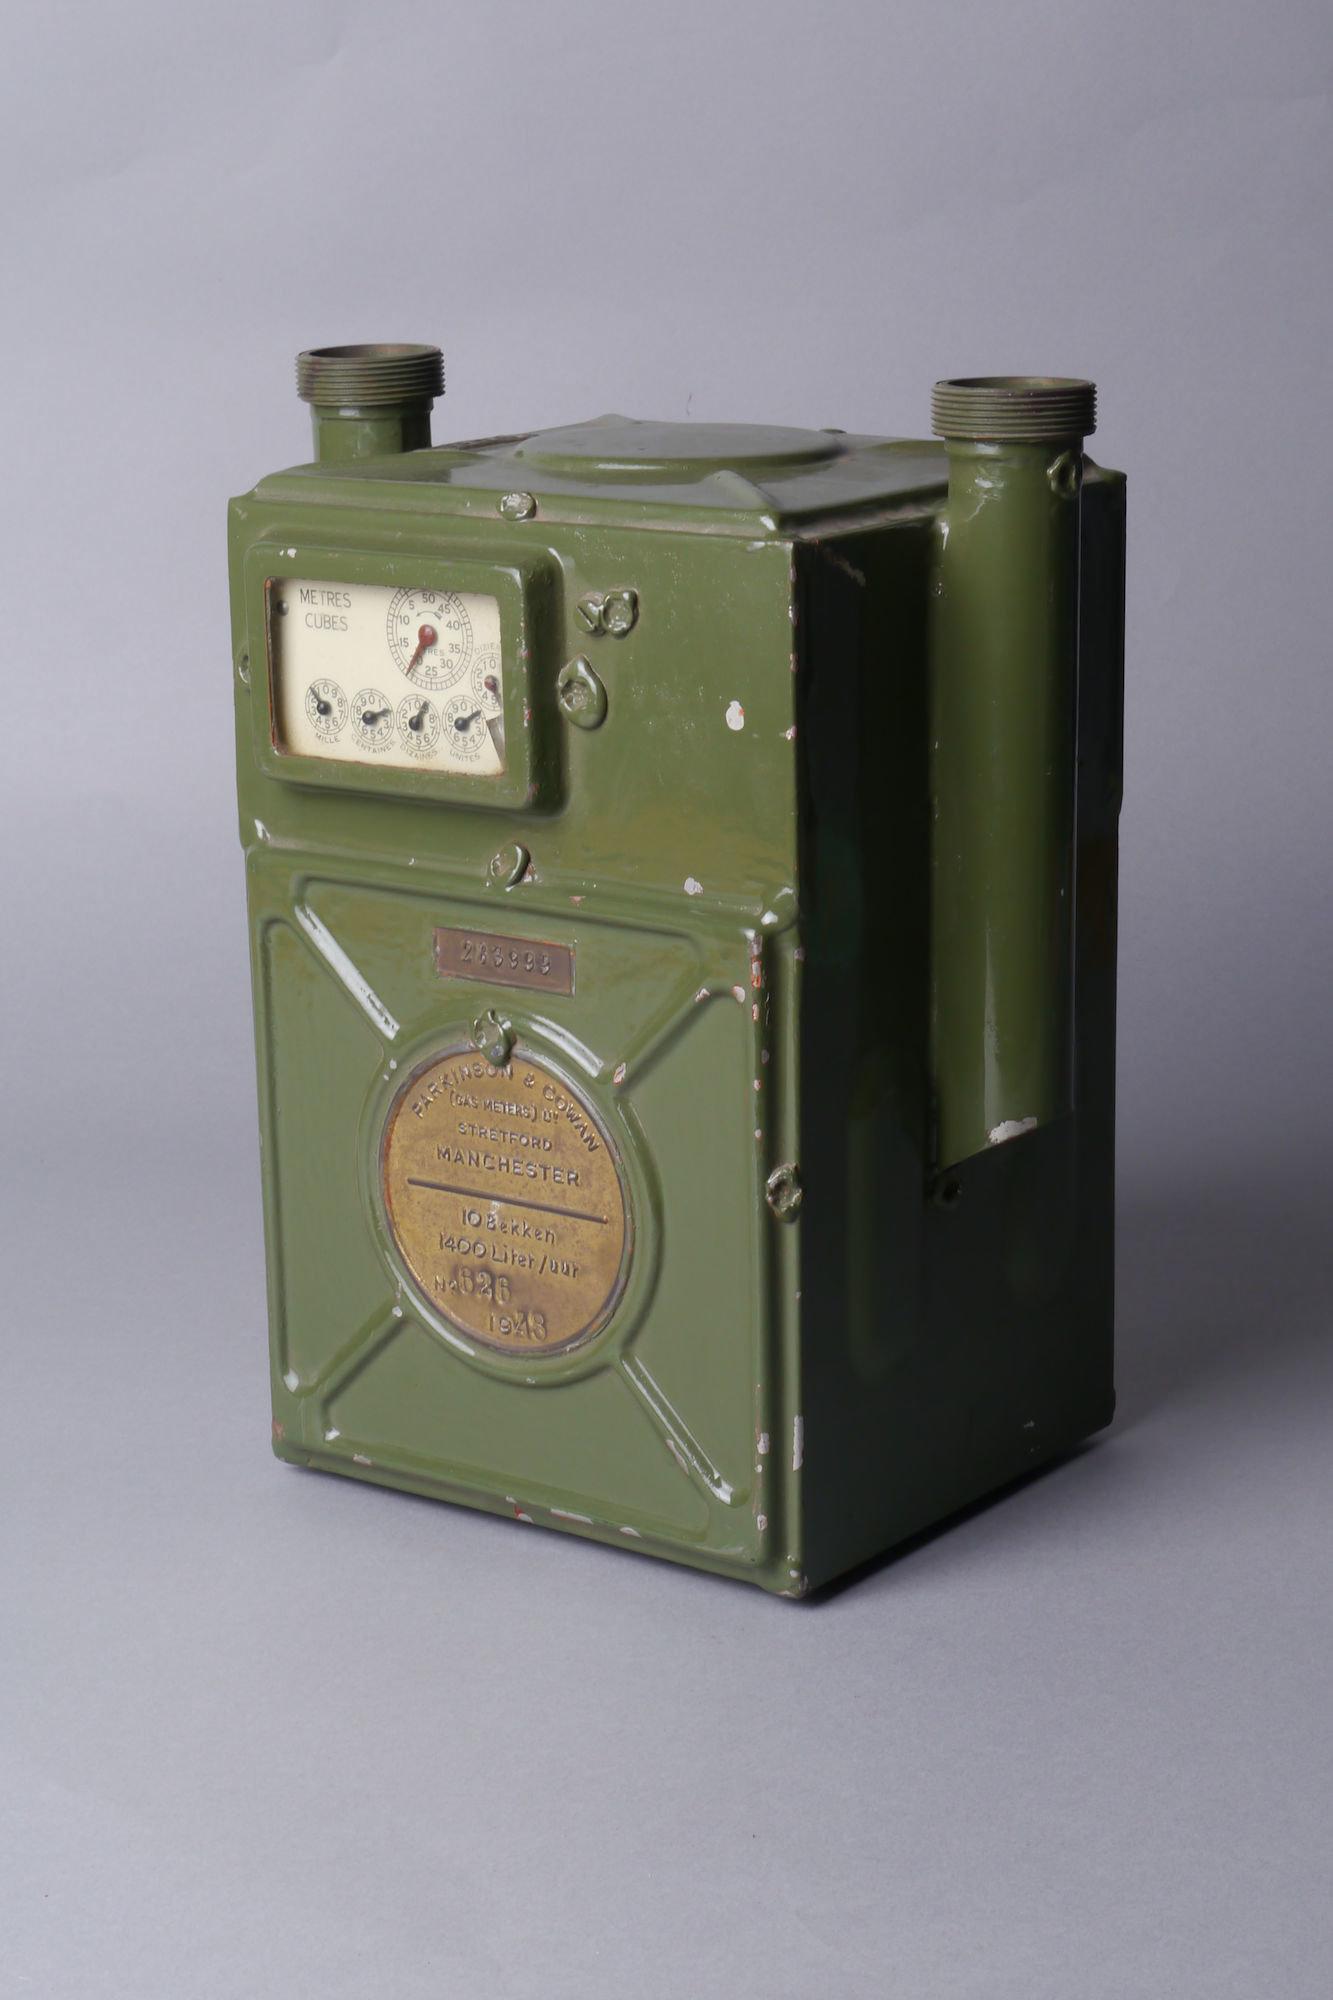 Verbruiksmeter voor gas van het merk Parkinson & Cowan